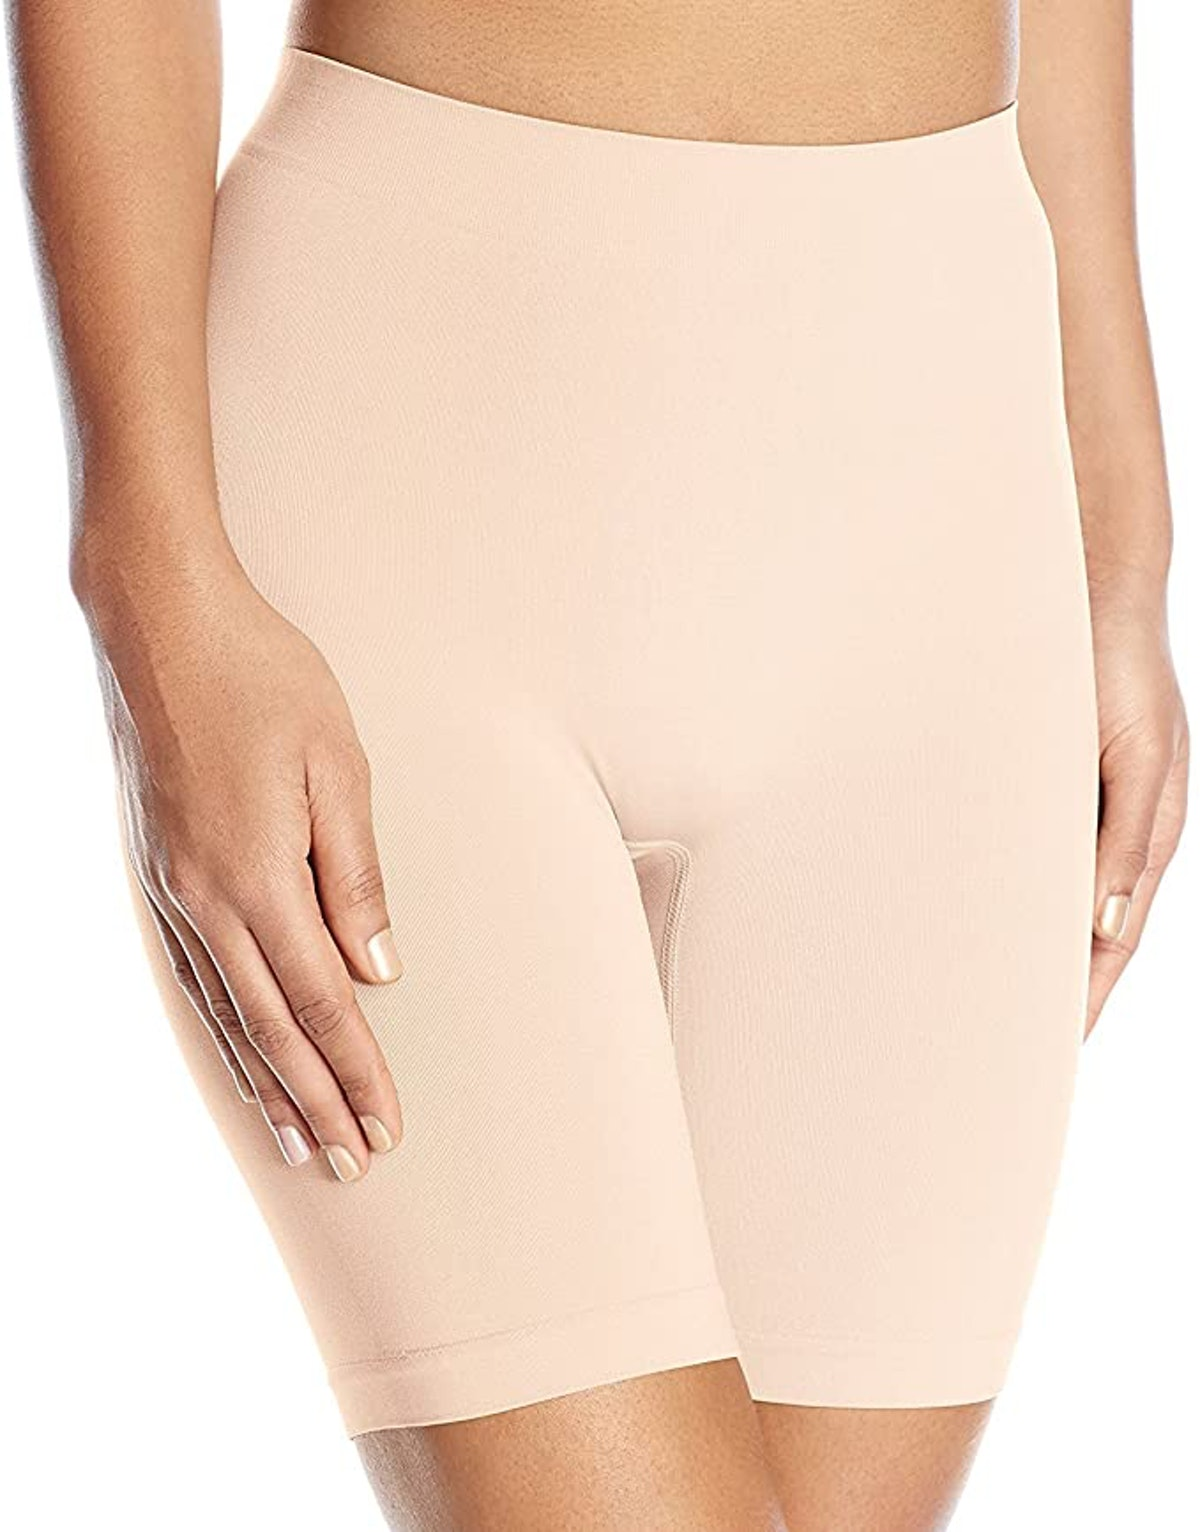 Vassarette Women's Comfortably Smooth Slip Short Panty